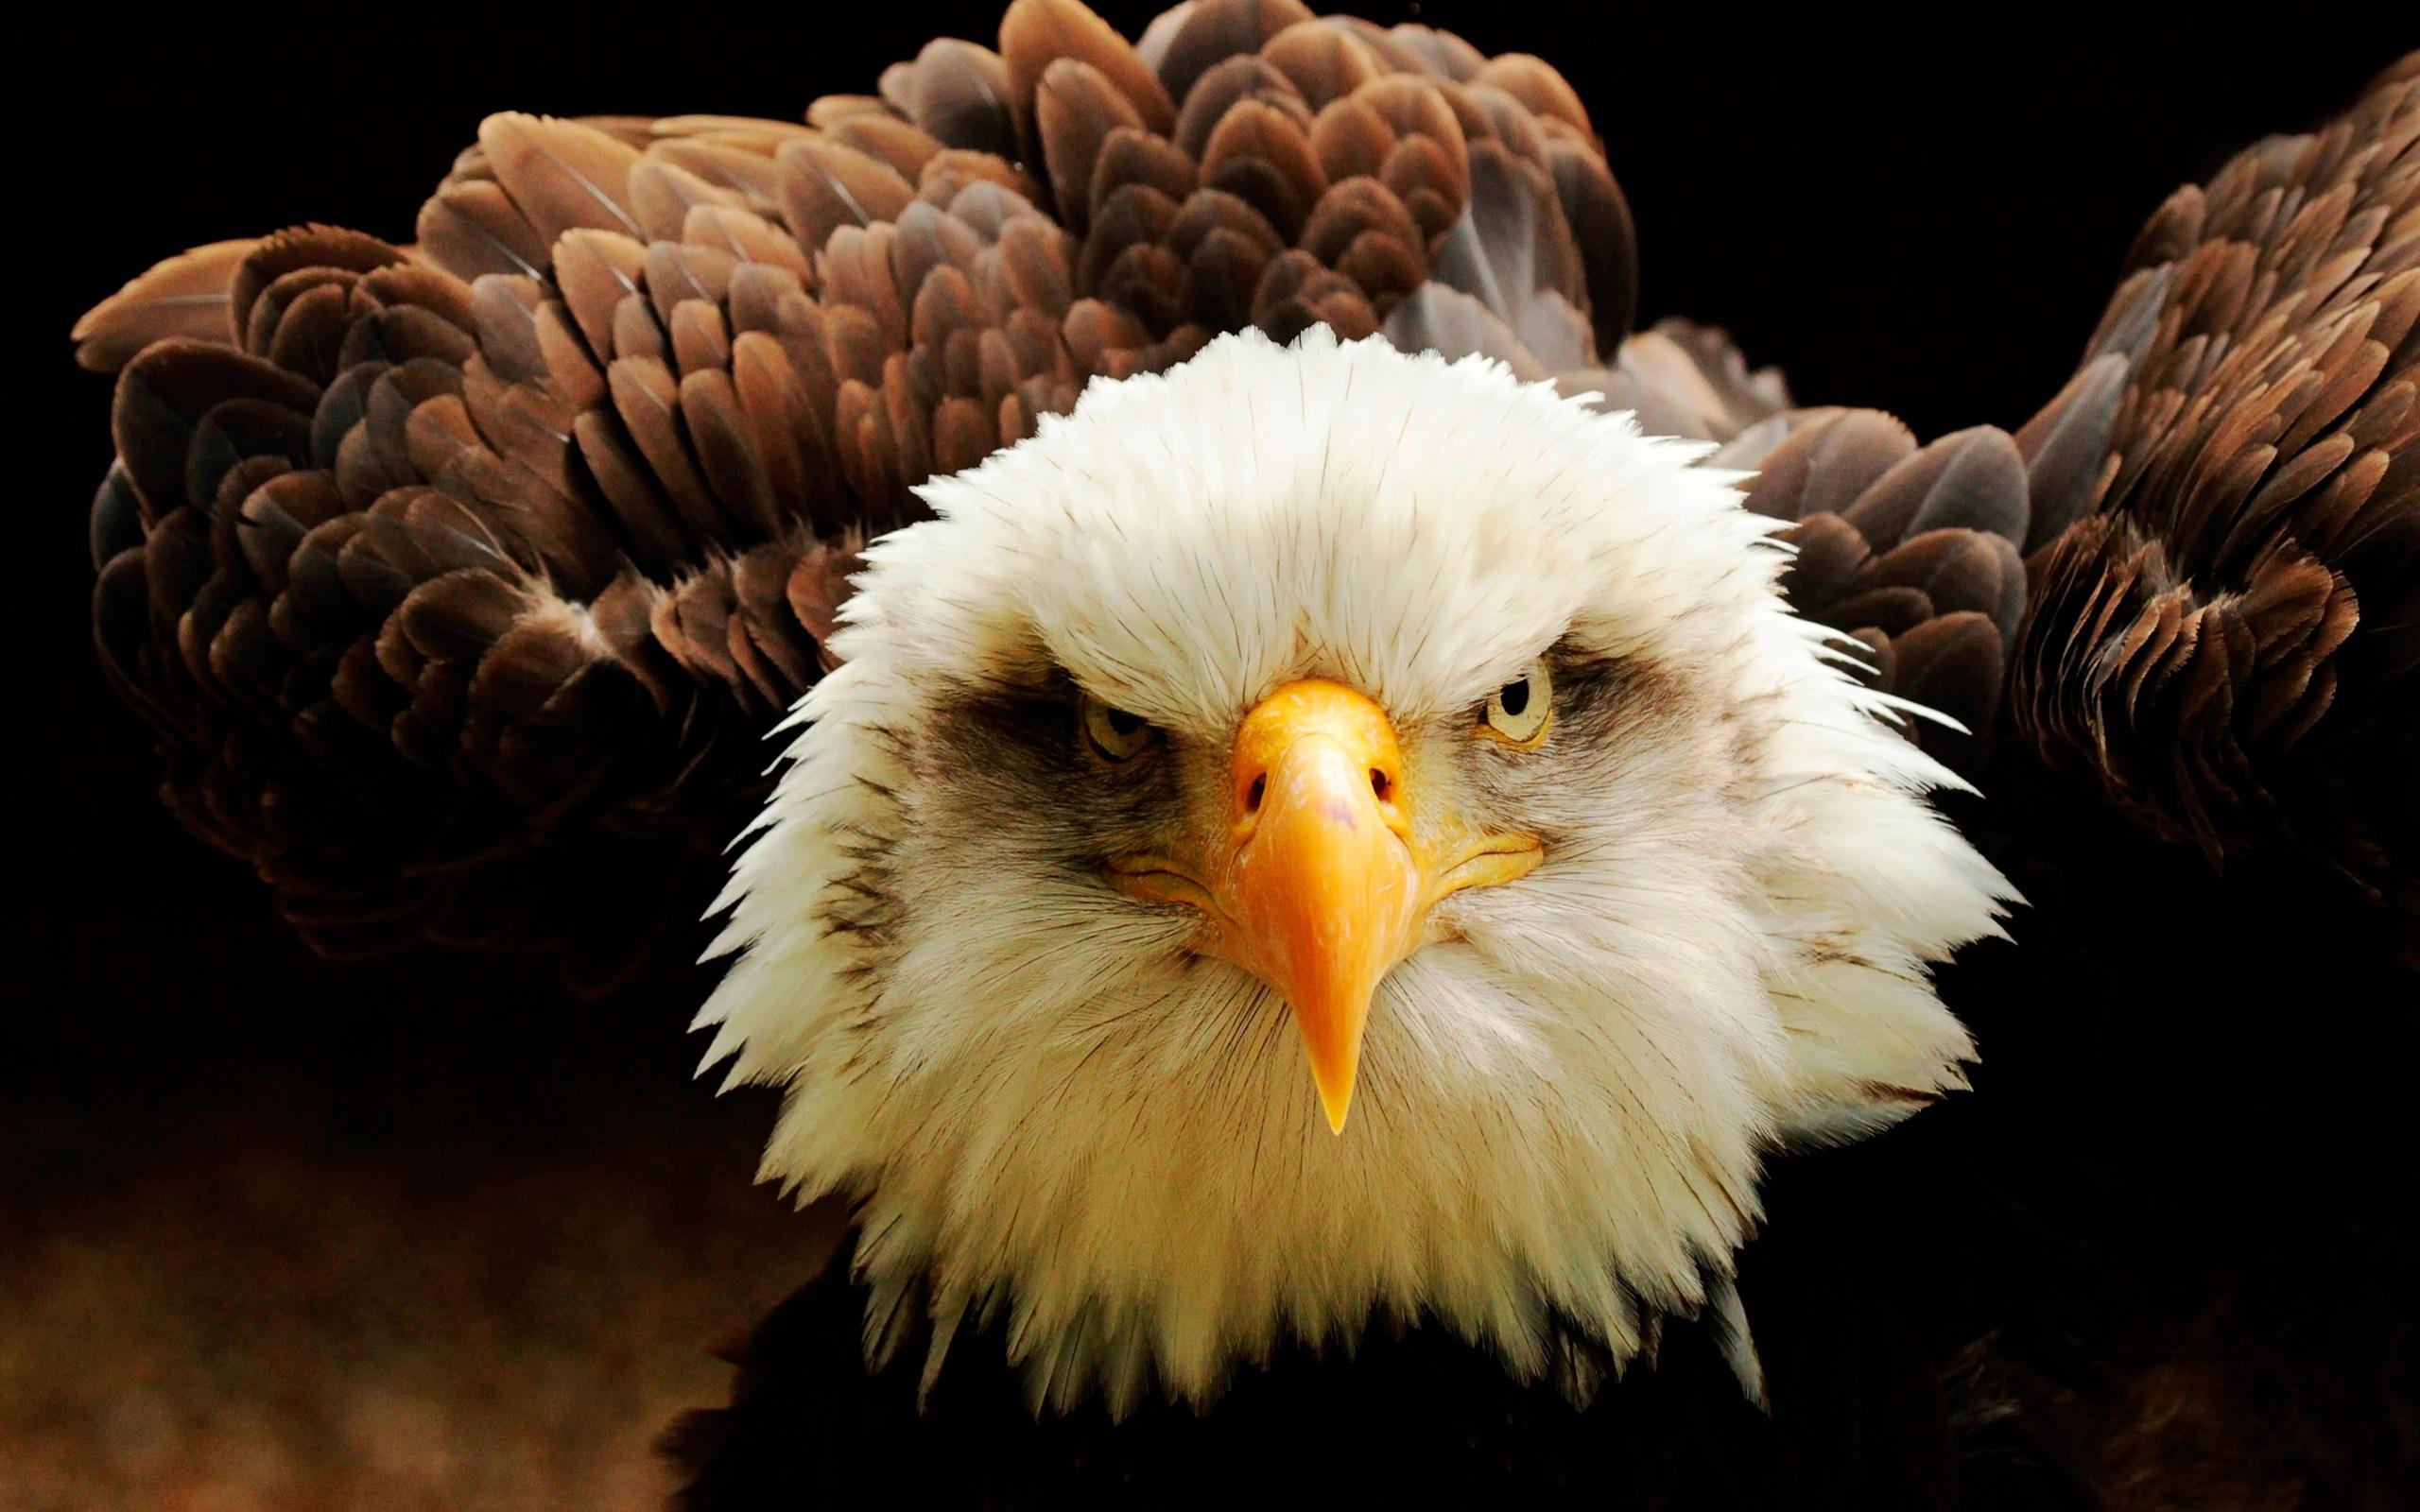 Фото орла на телефон свингеры любители